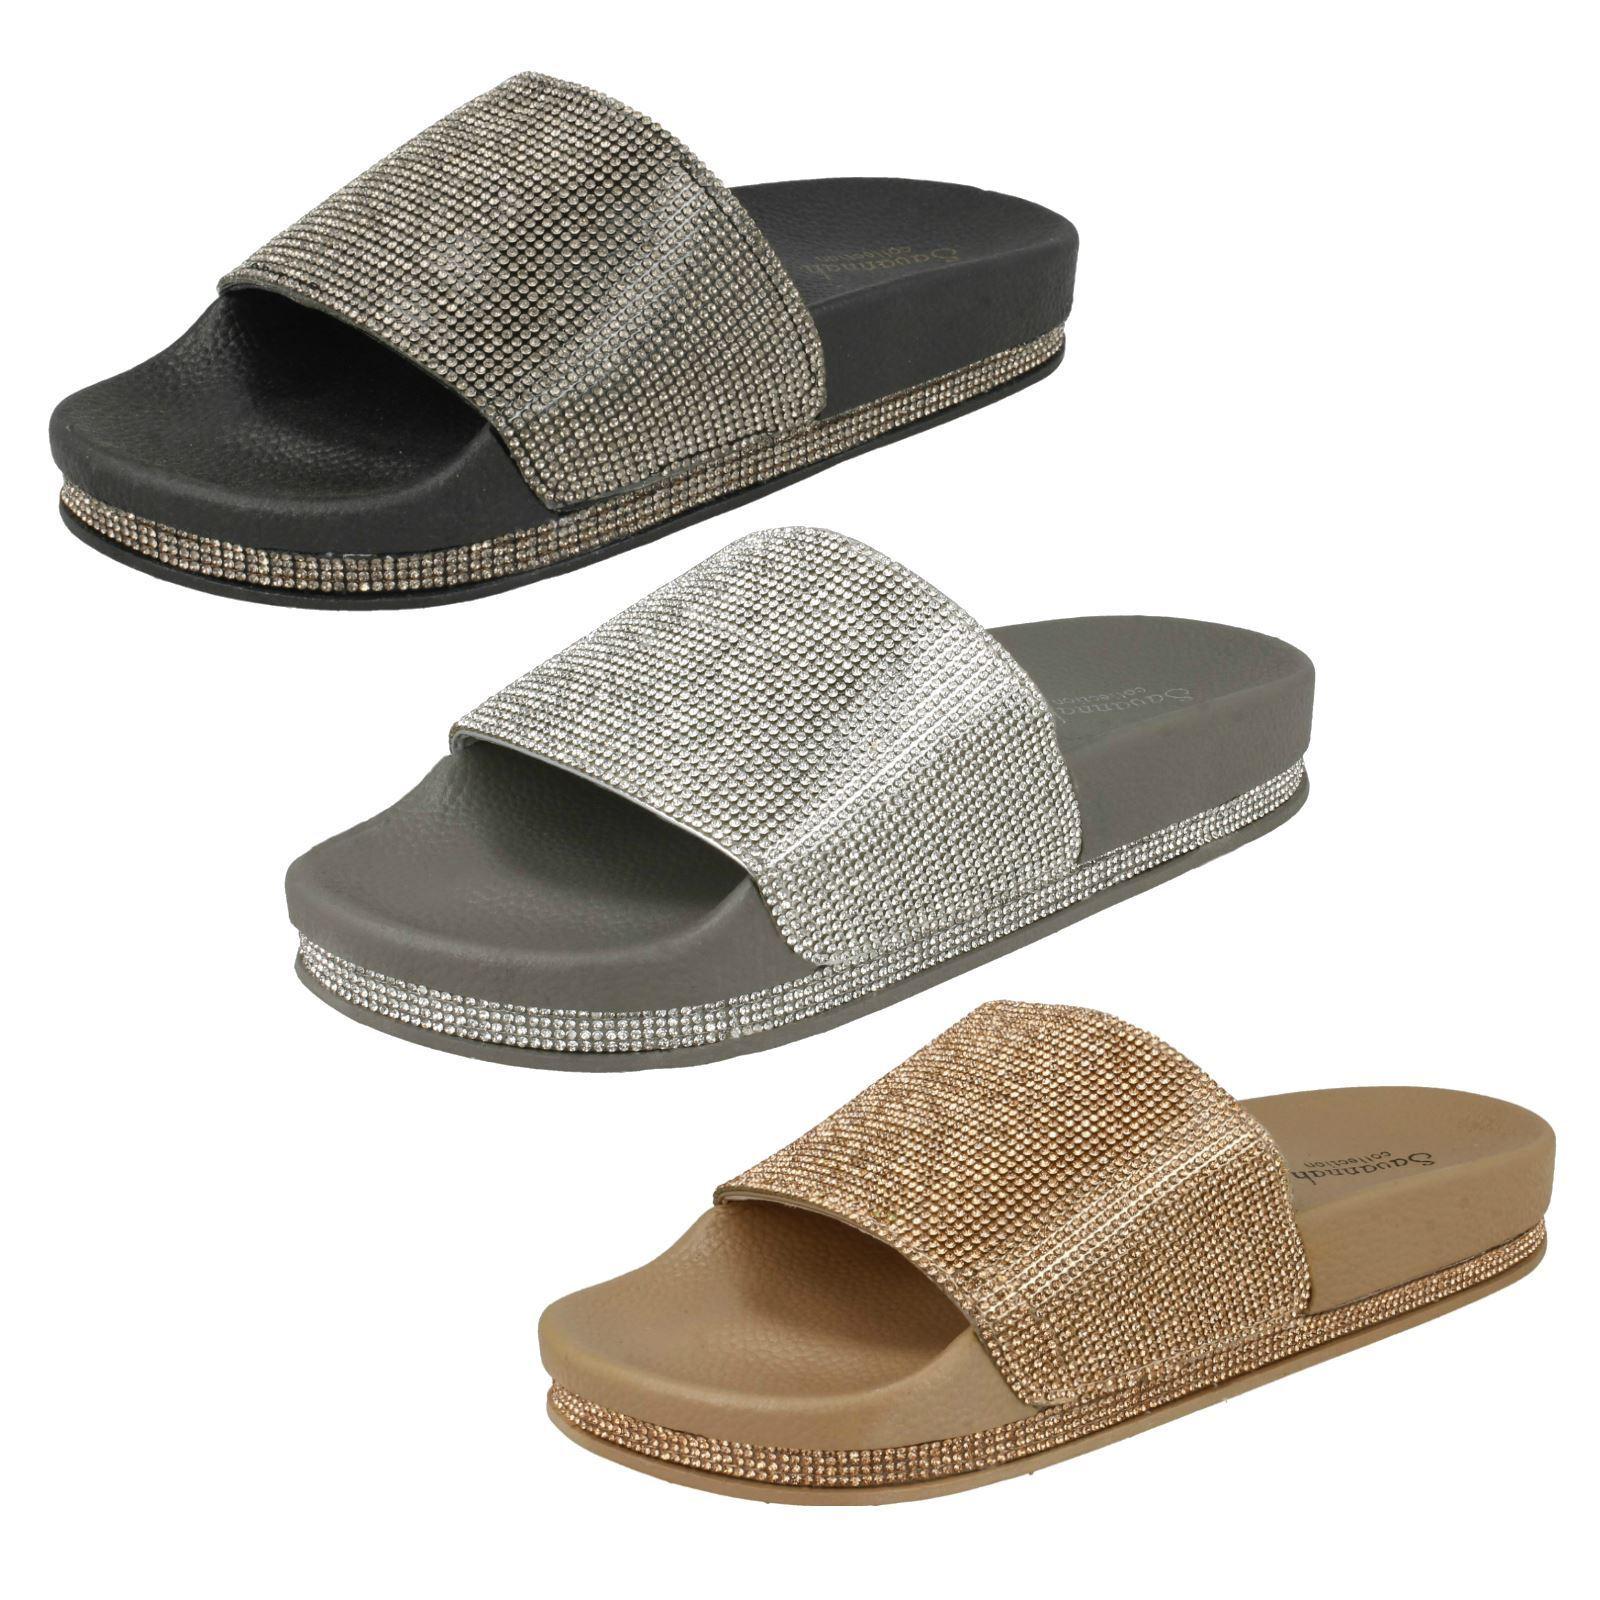 Men/Women Ladies Savannah Slip On Diamante Slider Mules Complete specification shoes range fashionable Vintage tide shoes specification WB1193 b10b8c